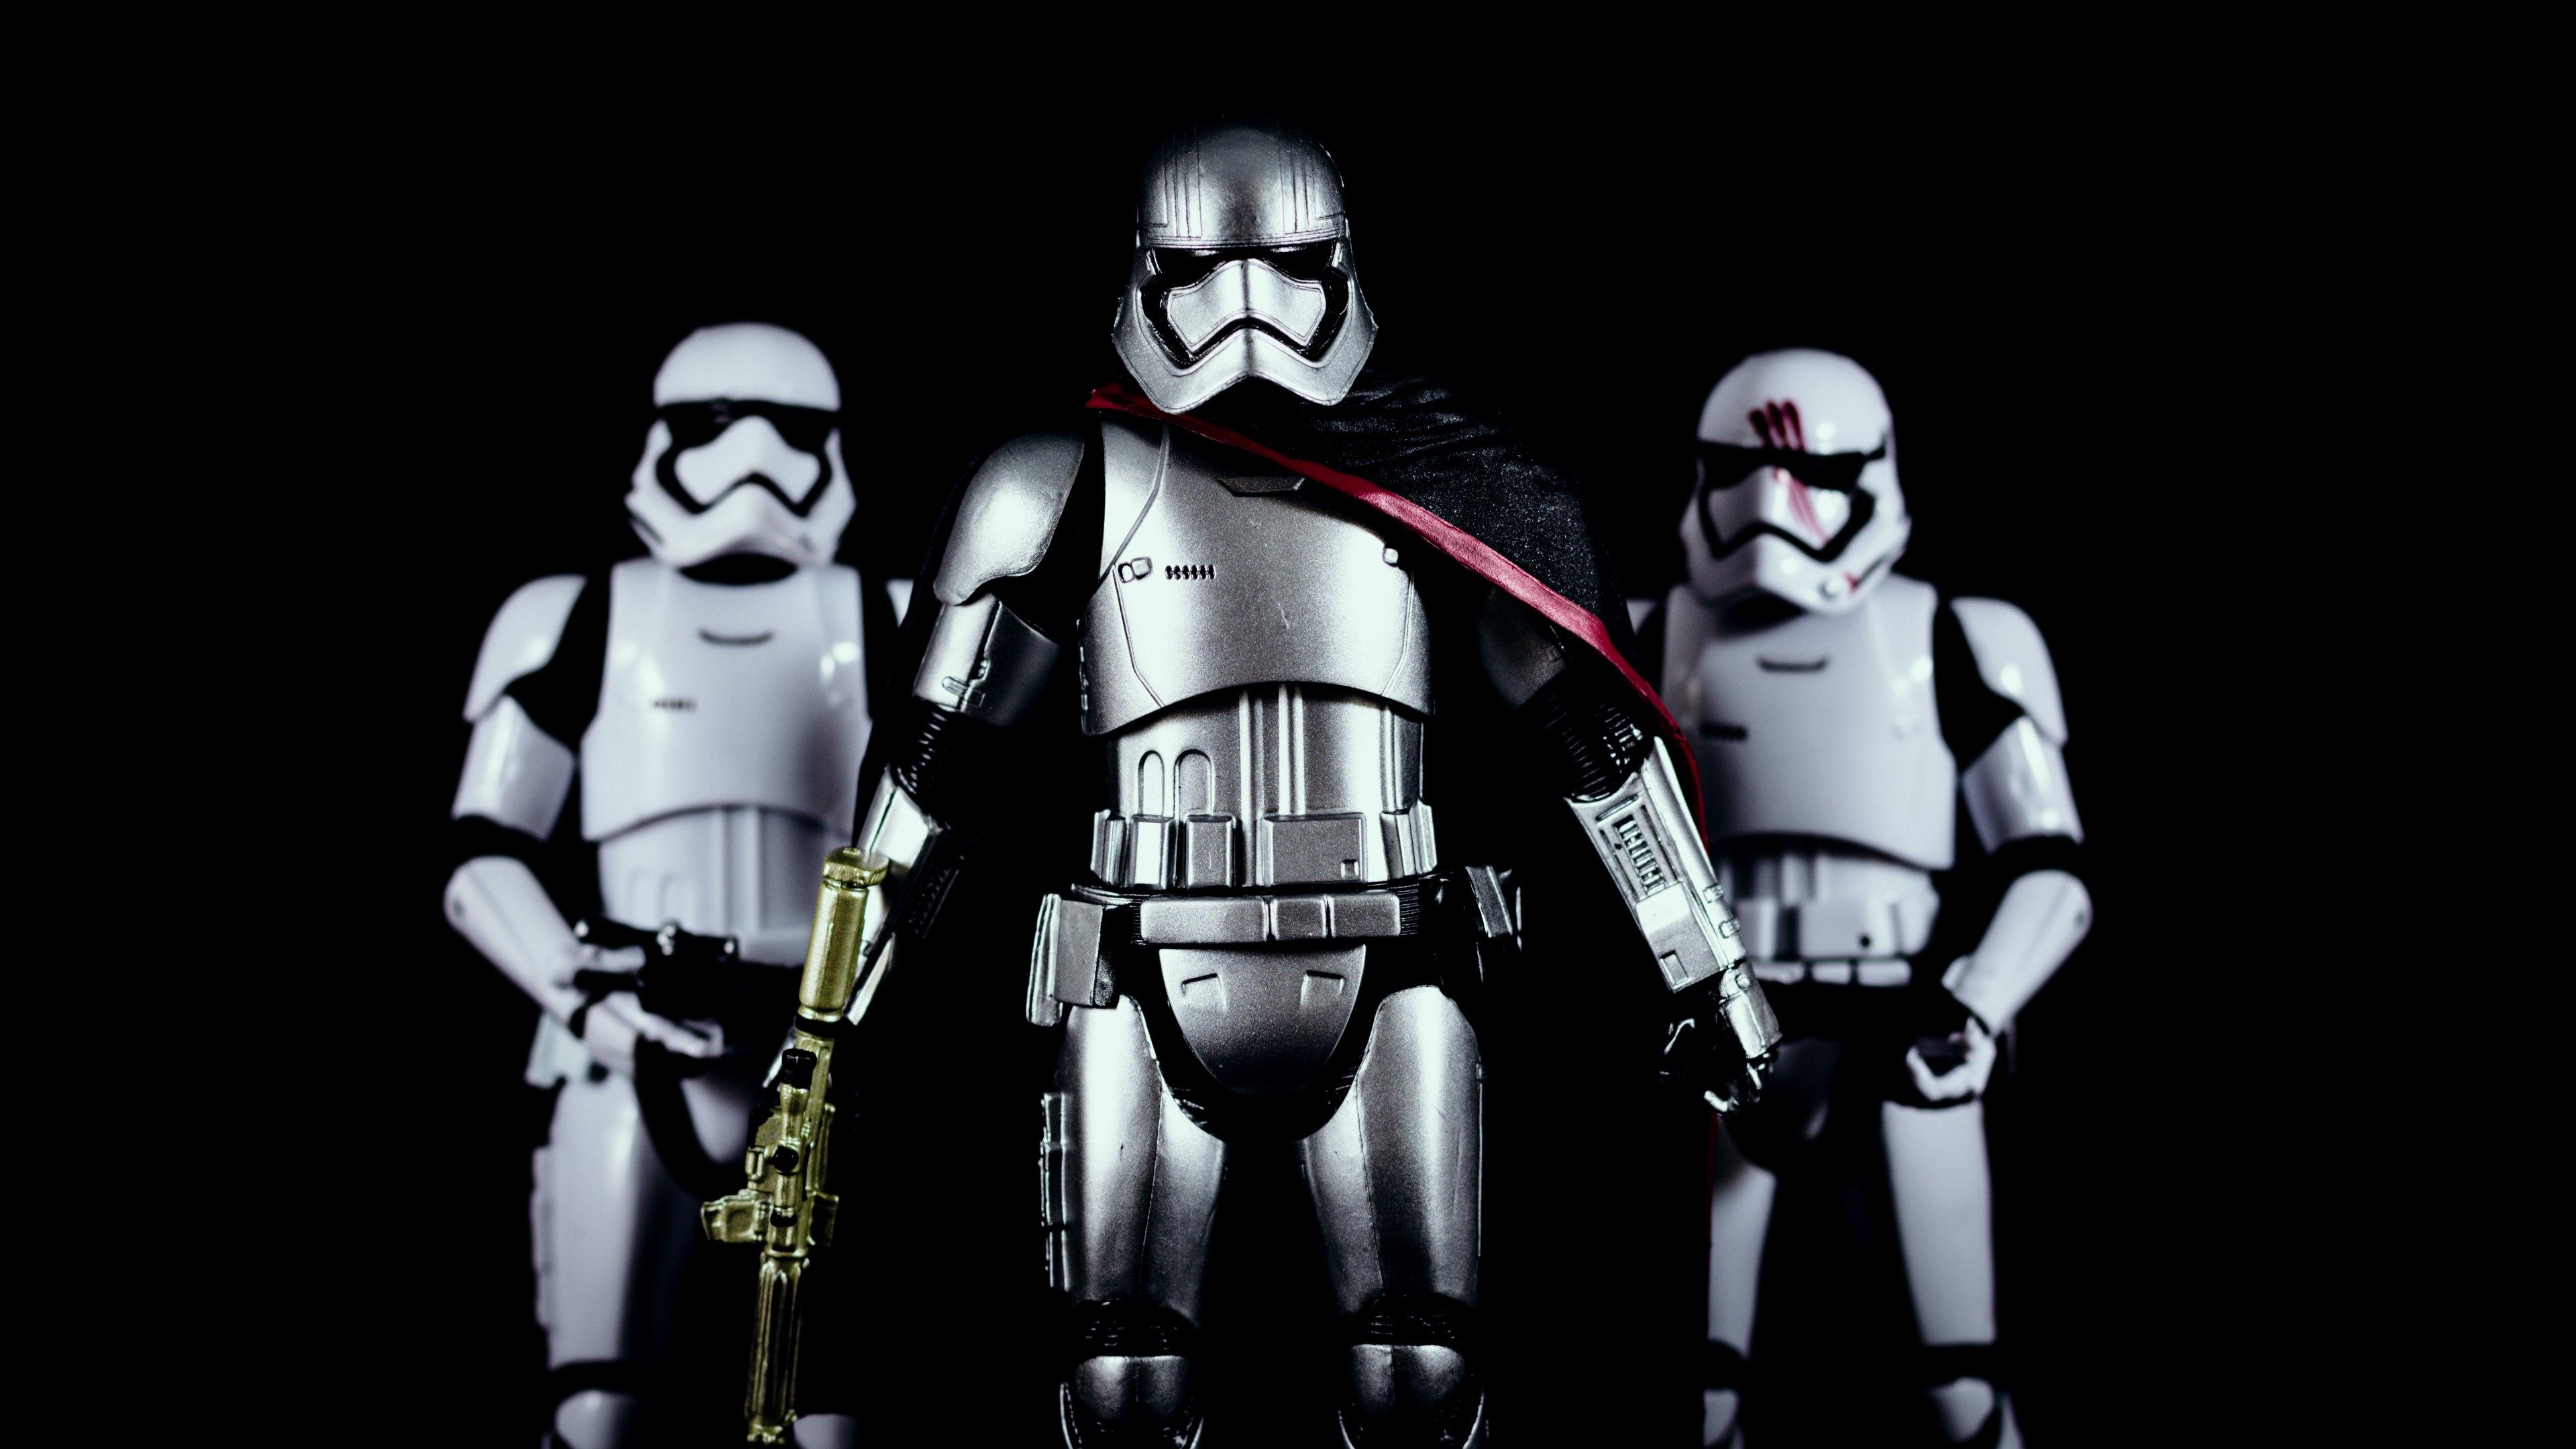 Silryg Darth Vader Lego Wallpaper